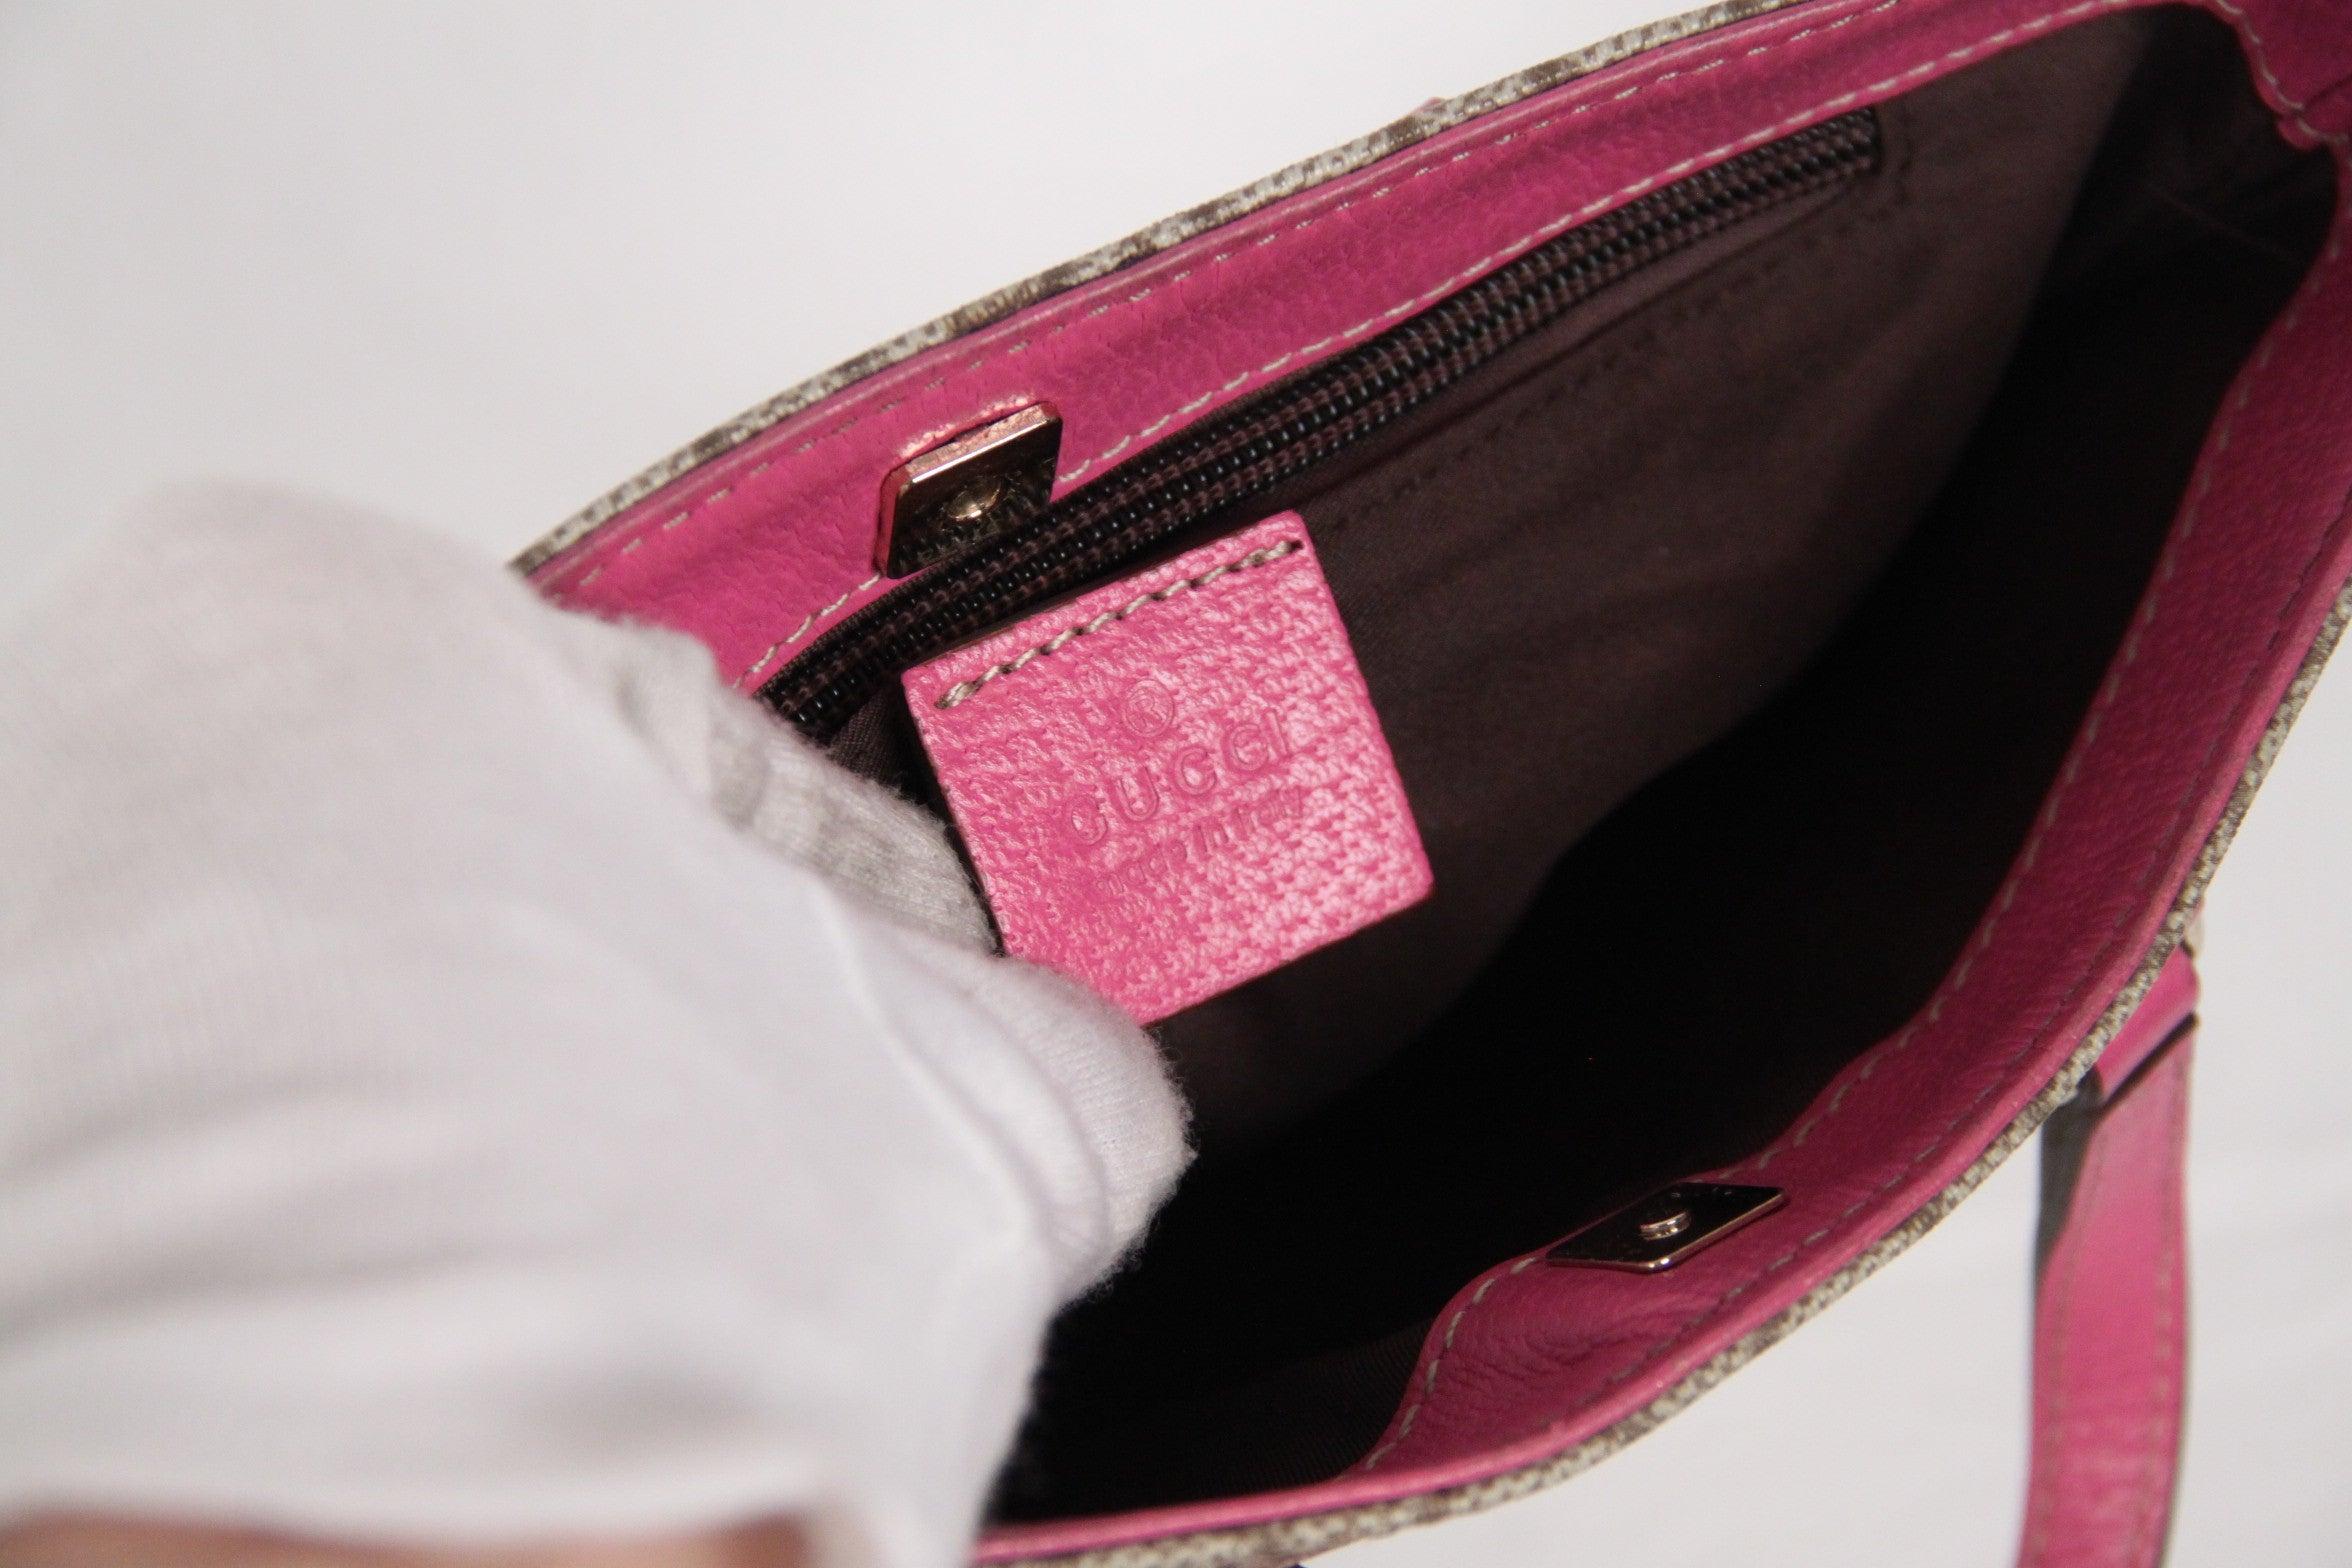 ceef2dab64f GUCCI Monogram Canvas SHOPPING BAG Tote Handbag w/ Pink Trim For Sale at  1stdibs